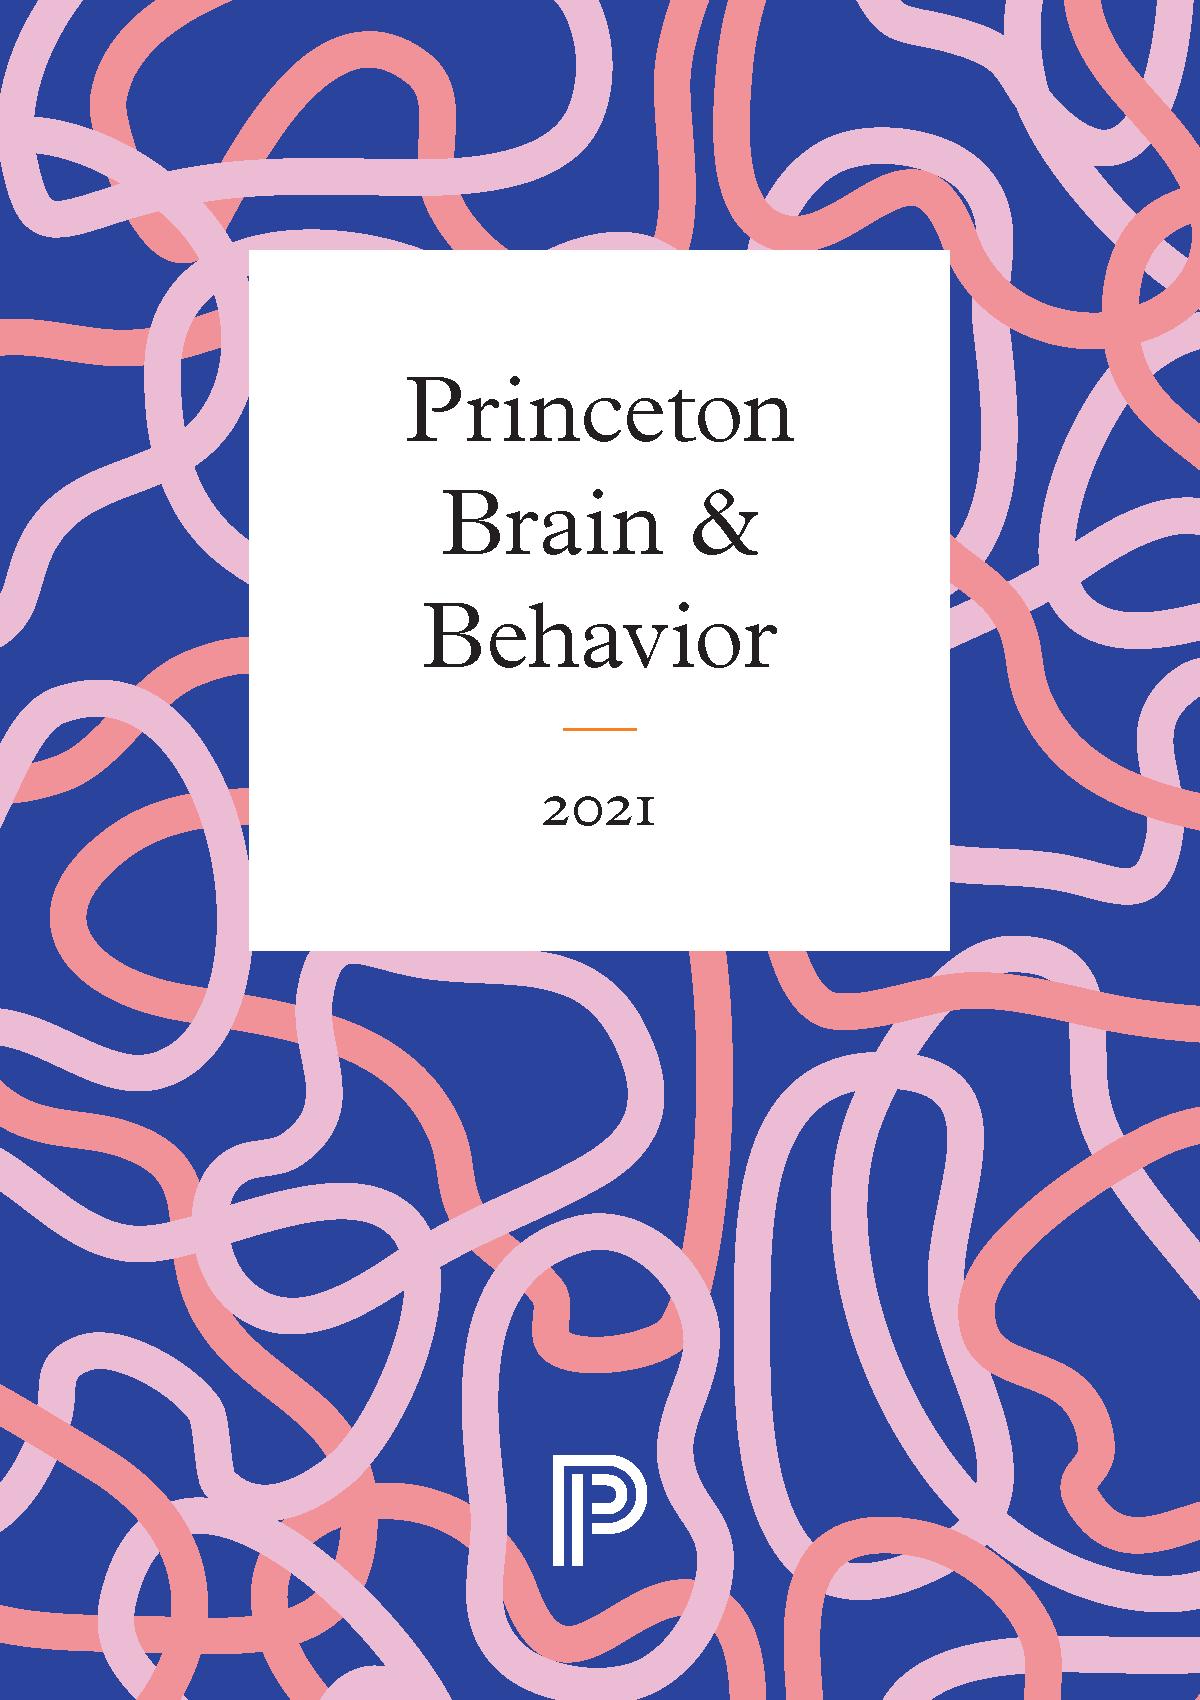 Brain & Behavior 2021 Catalog Cover